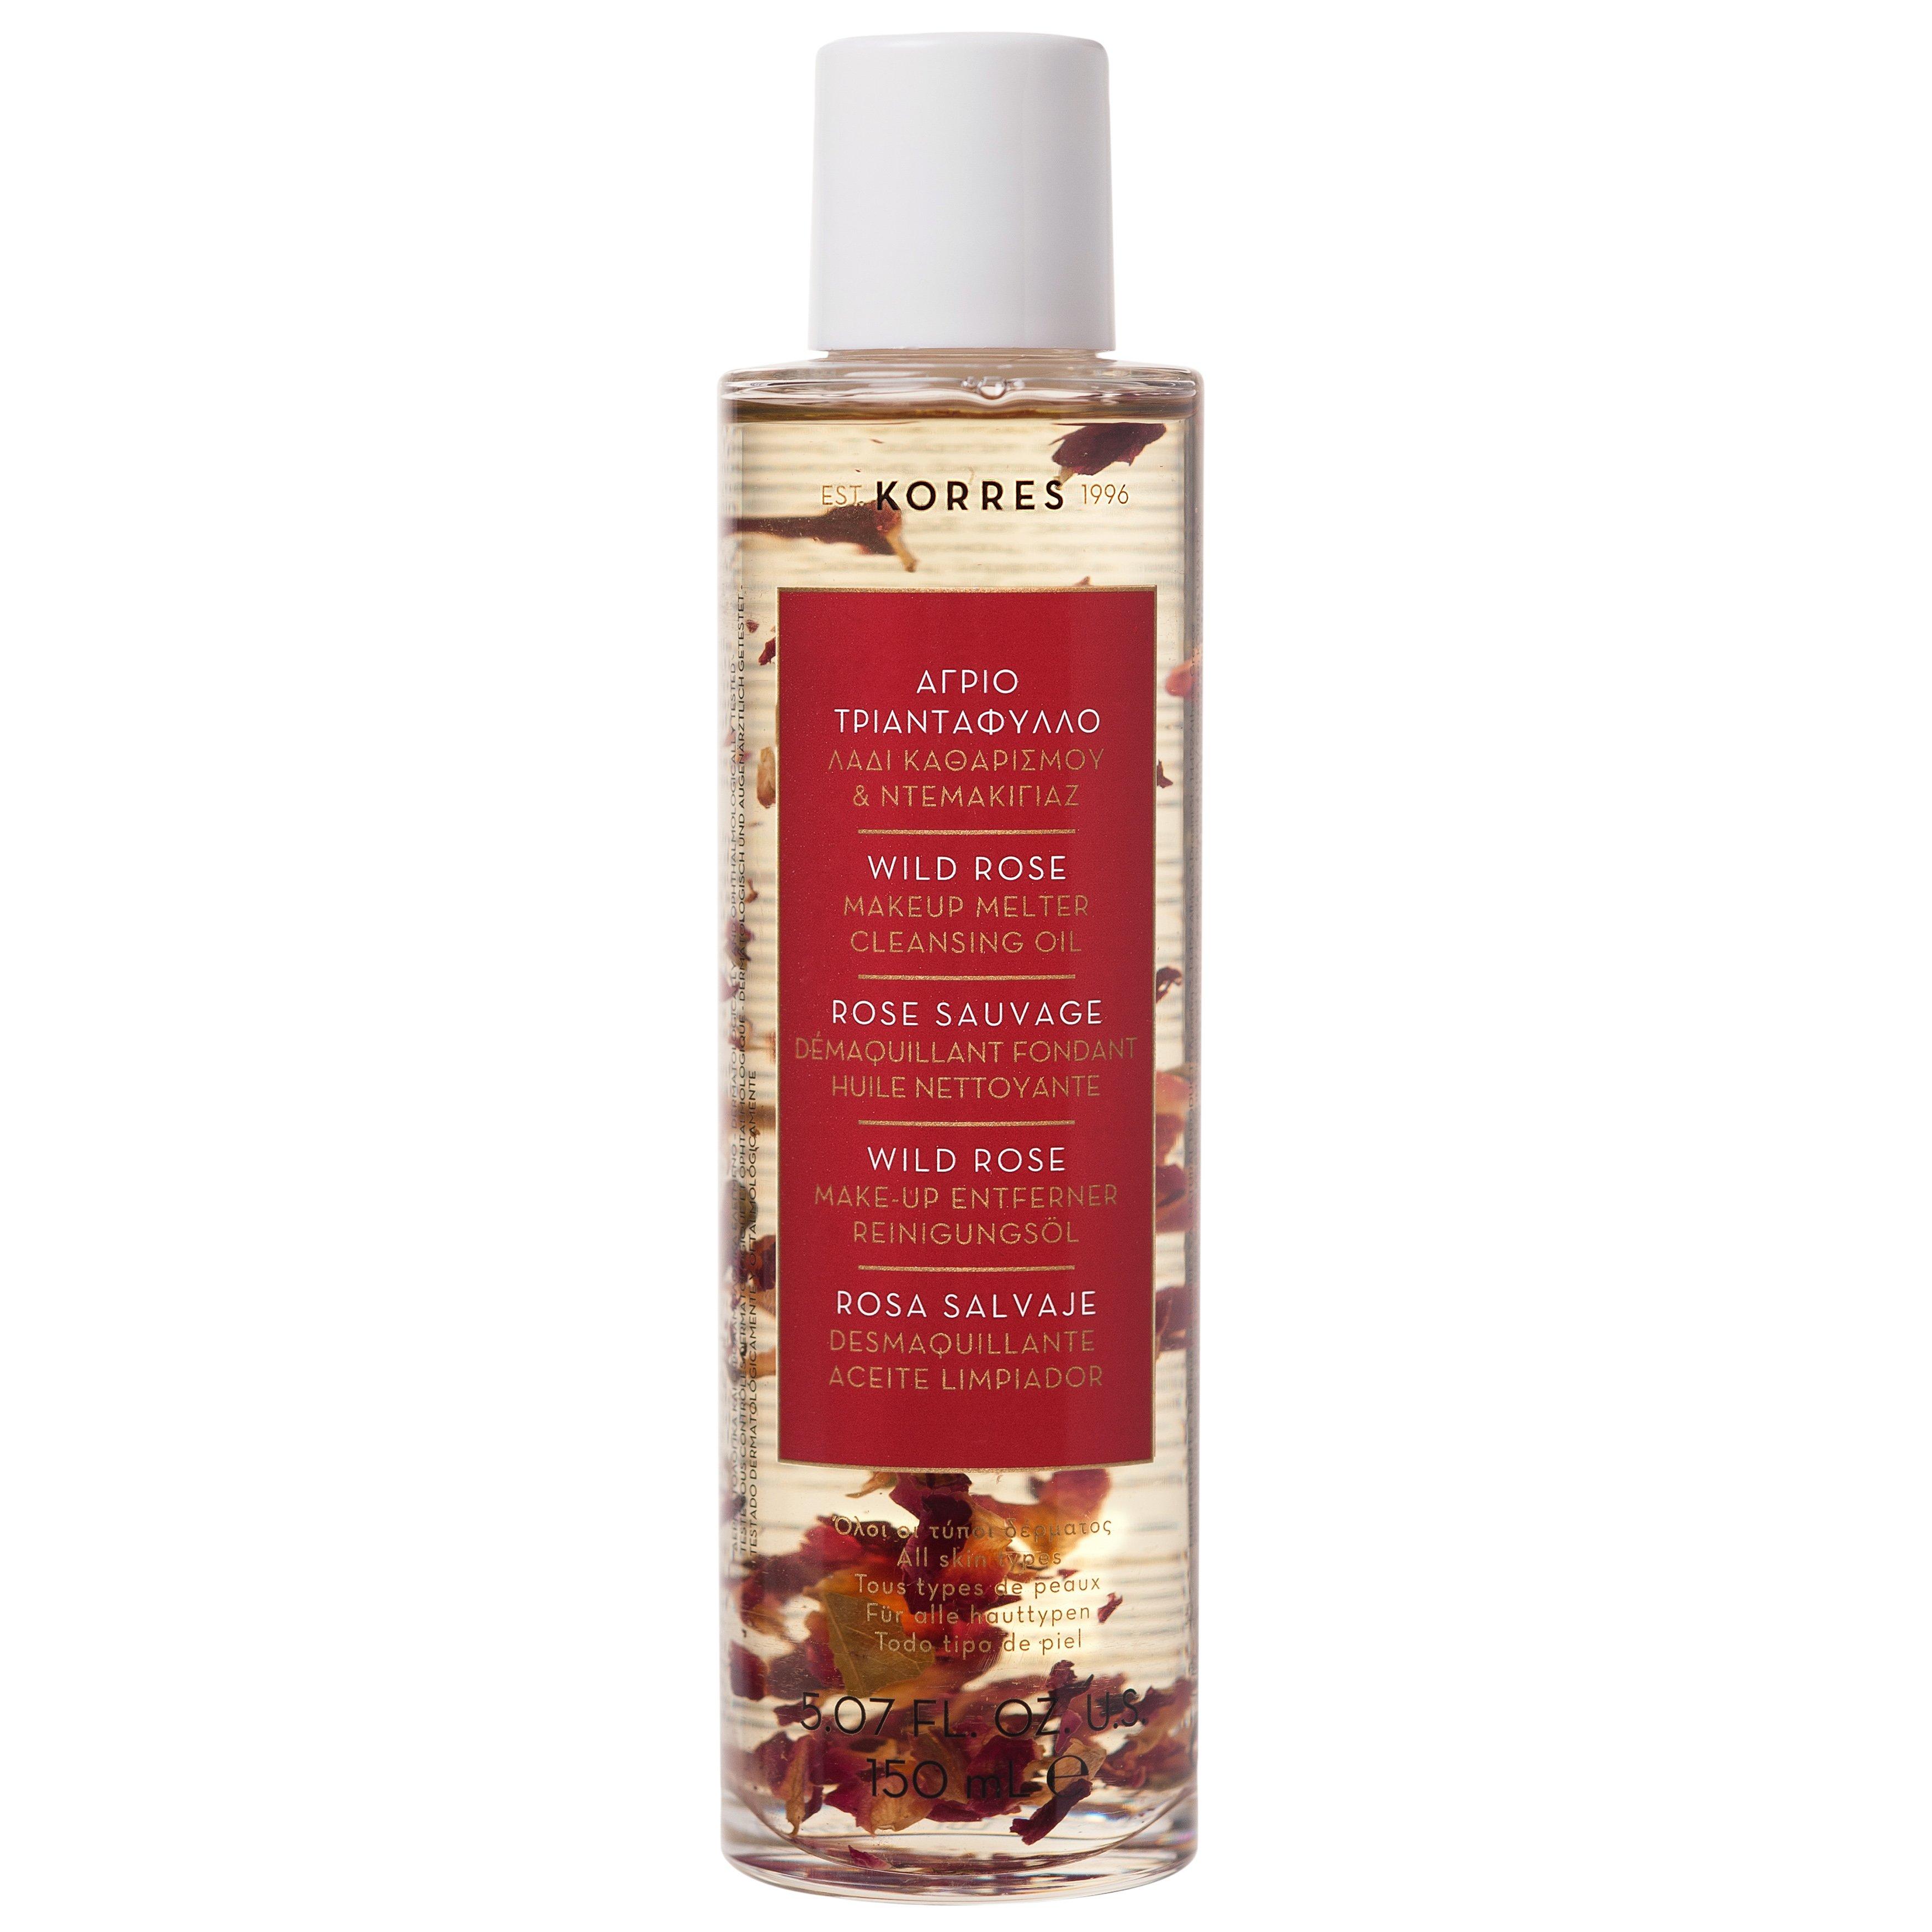 Korres Wild Rose Makeup Melter Cleansing Oil Λάδι Καθαρισμού & Ντεμακιγιάζ με Άγριο Τριαντάφυλλο, Όλοι οι Τύποι Δέρματος 150ml